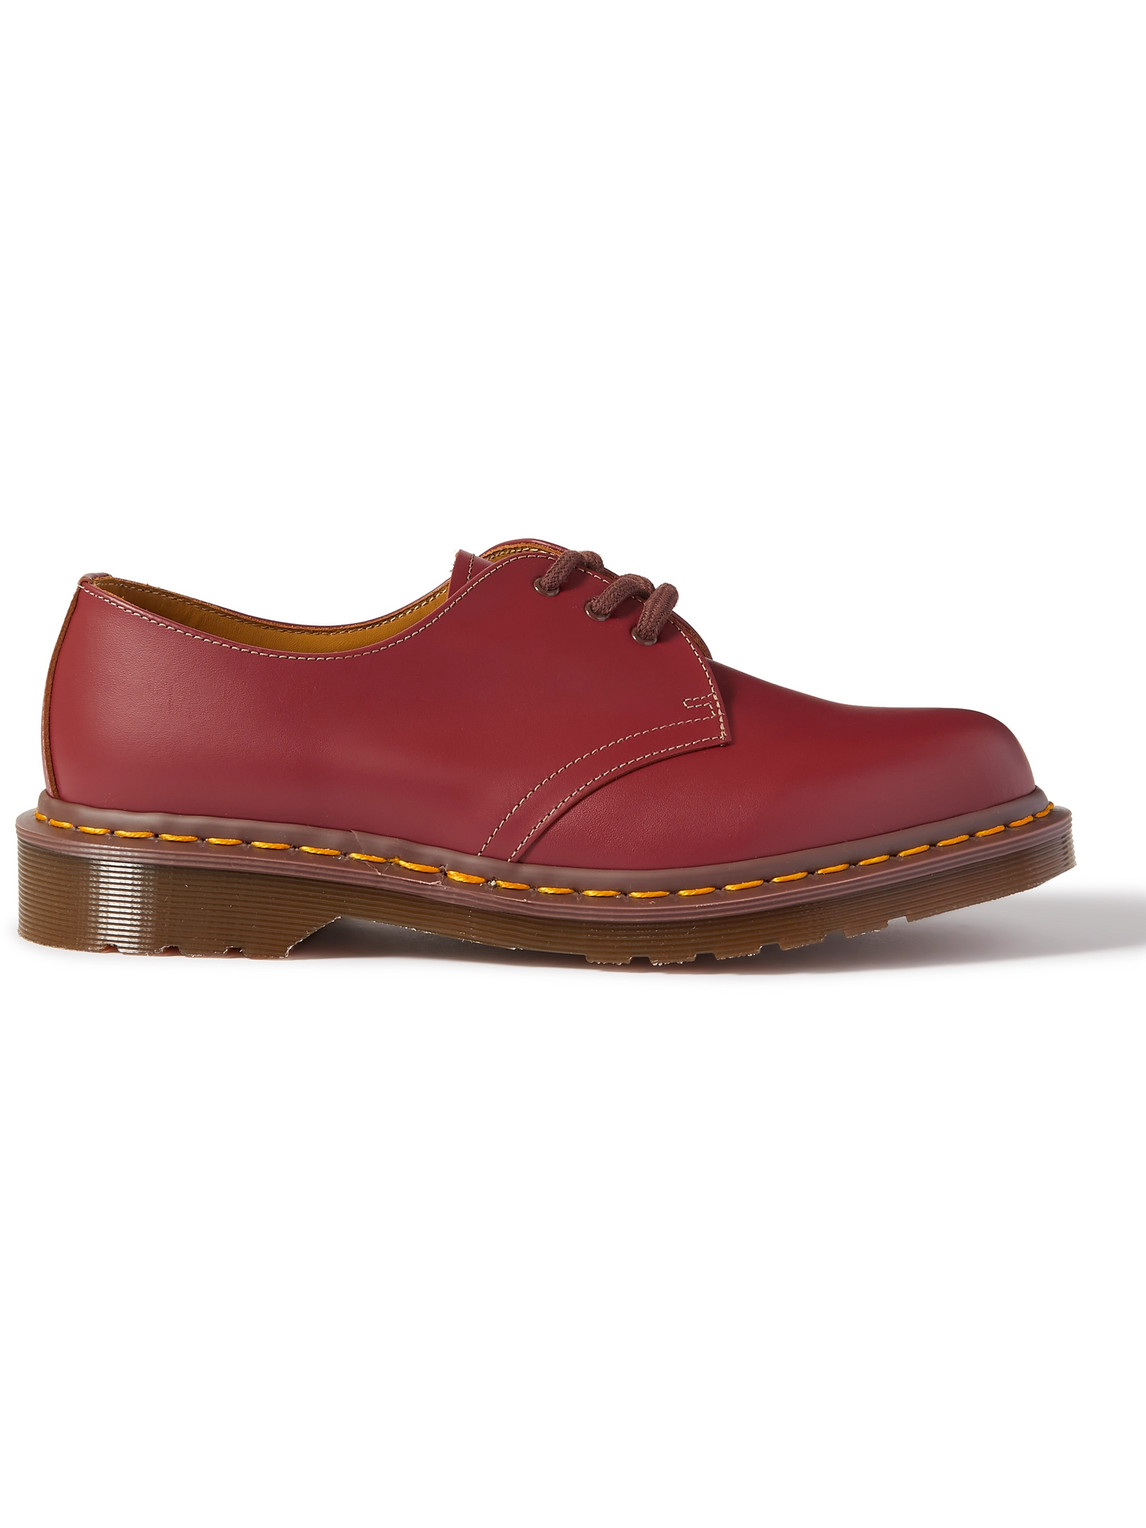 Dr. Martens Shoes 1461 LEATHER DERBY SHOES